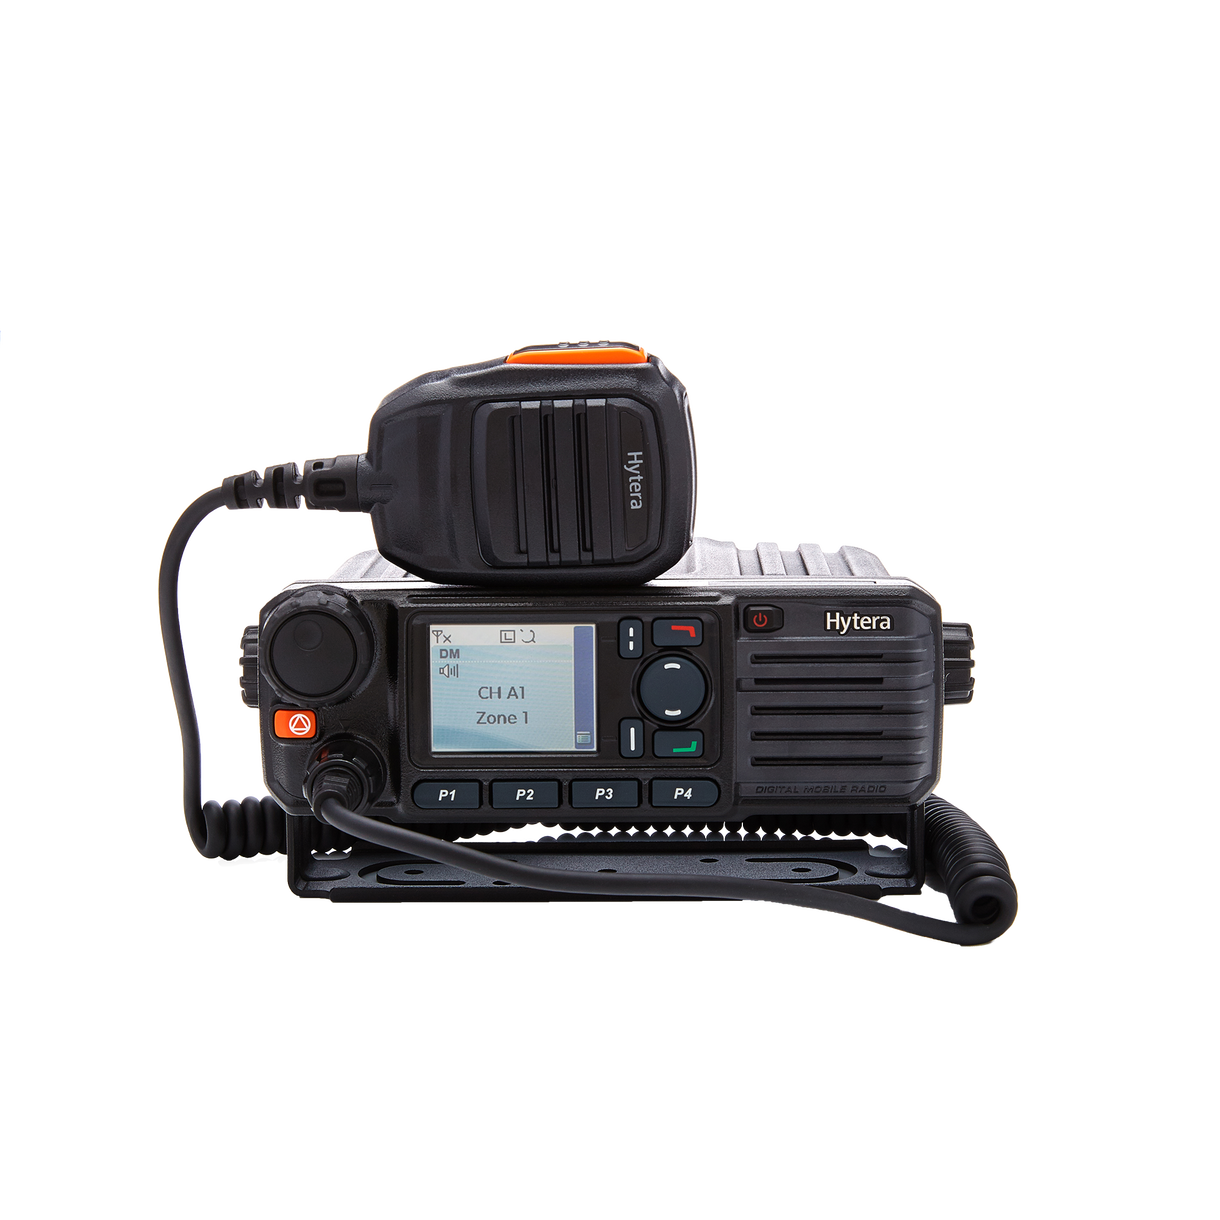 Hytera UHF Digital Mobile Radio 1024 Ch LCD